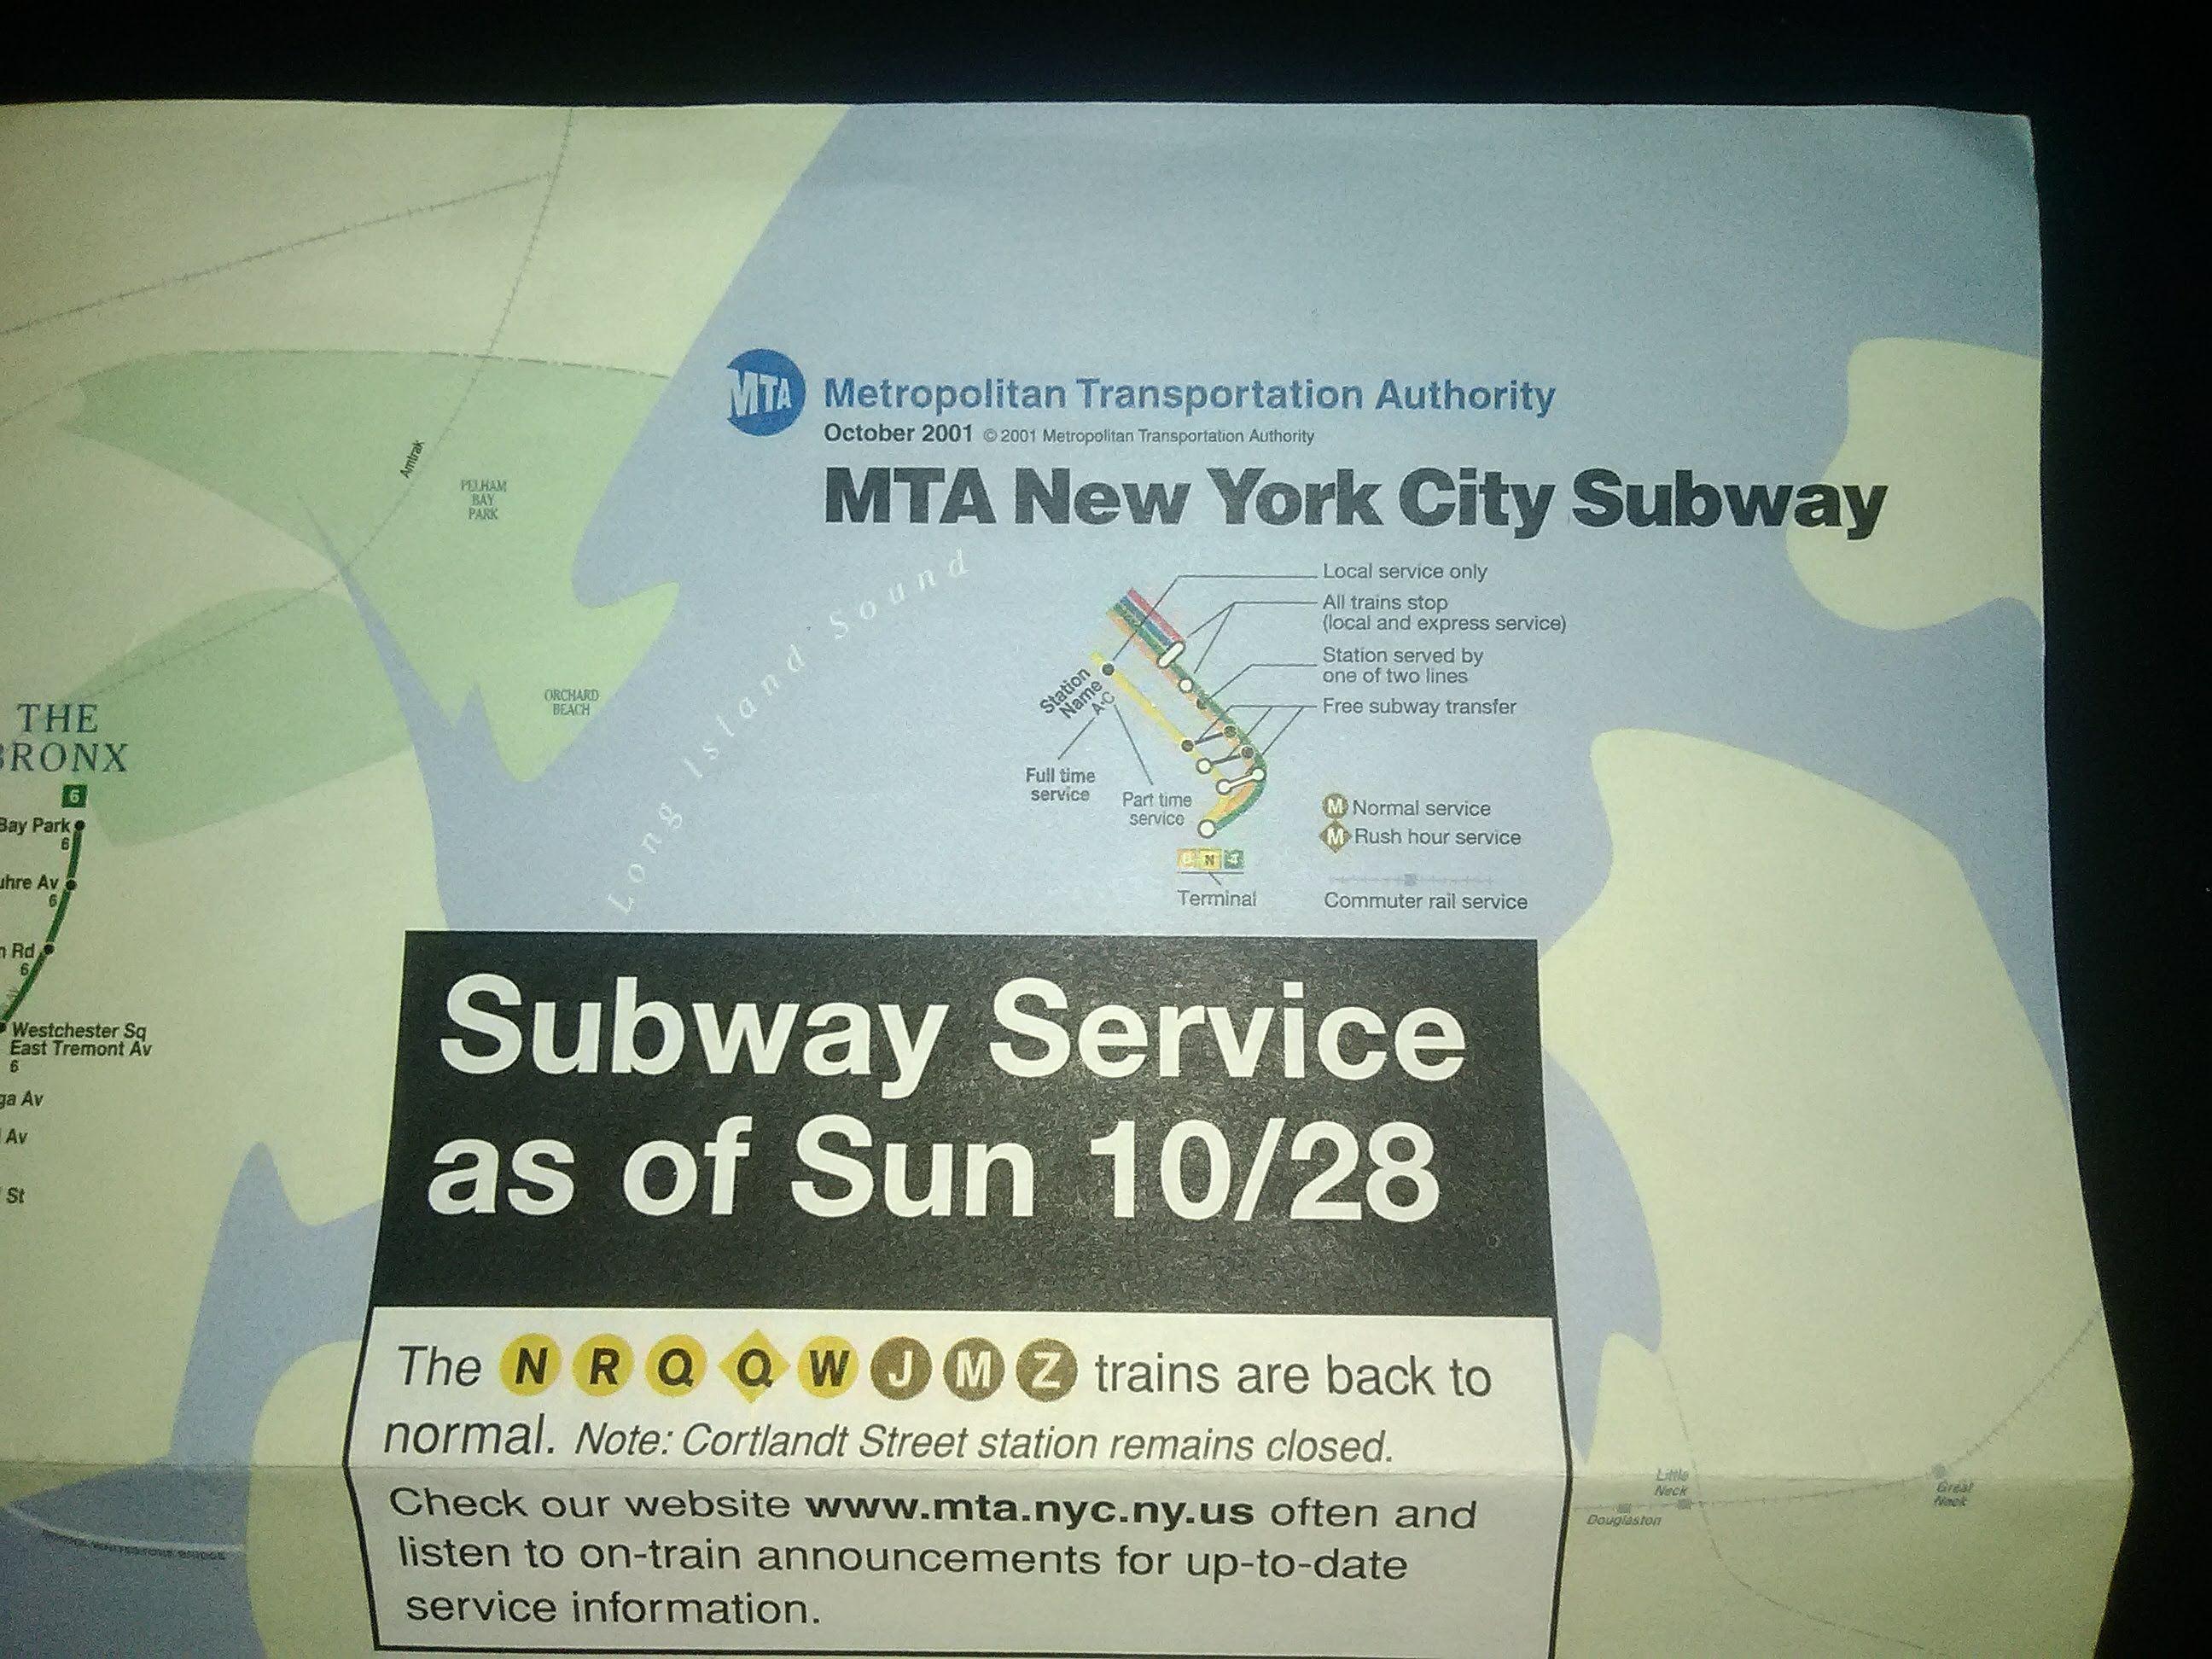 Nyc Subway Map Ebay.Details About Six Rare Maps Nyct 10 28 2001 Post 9 11 Subway Map